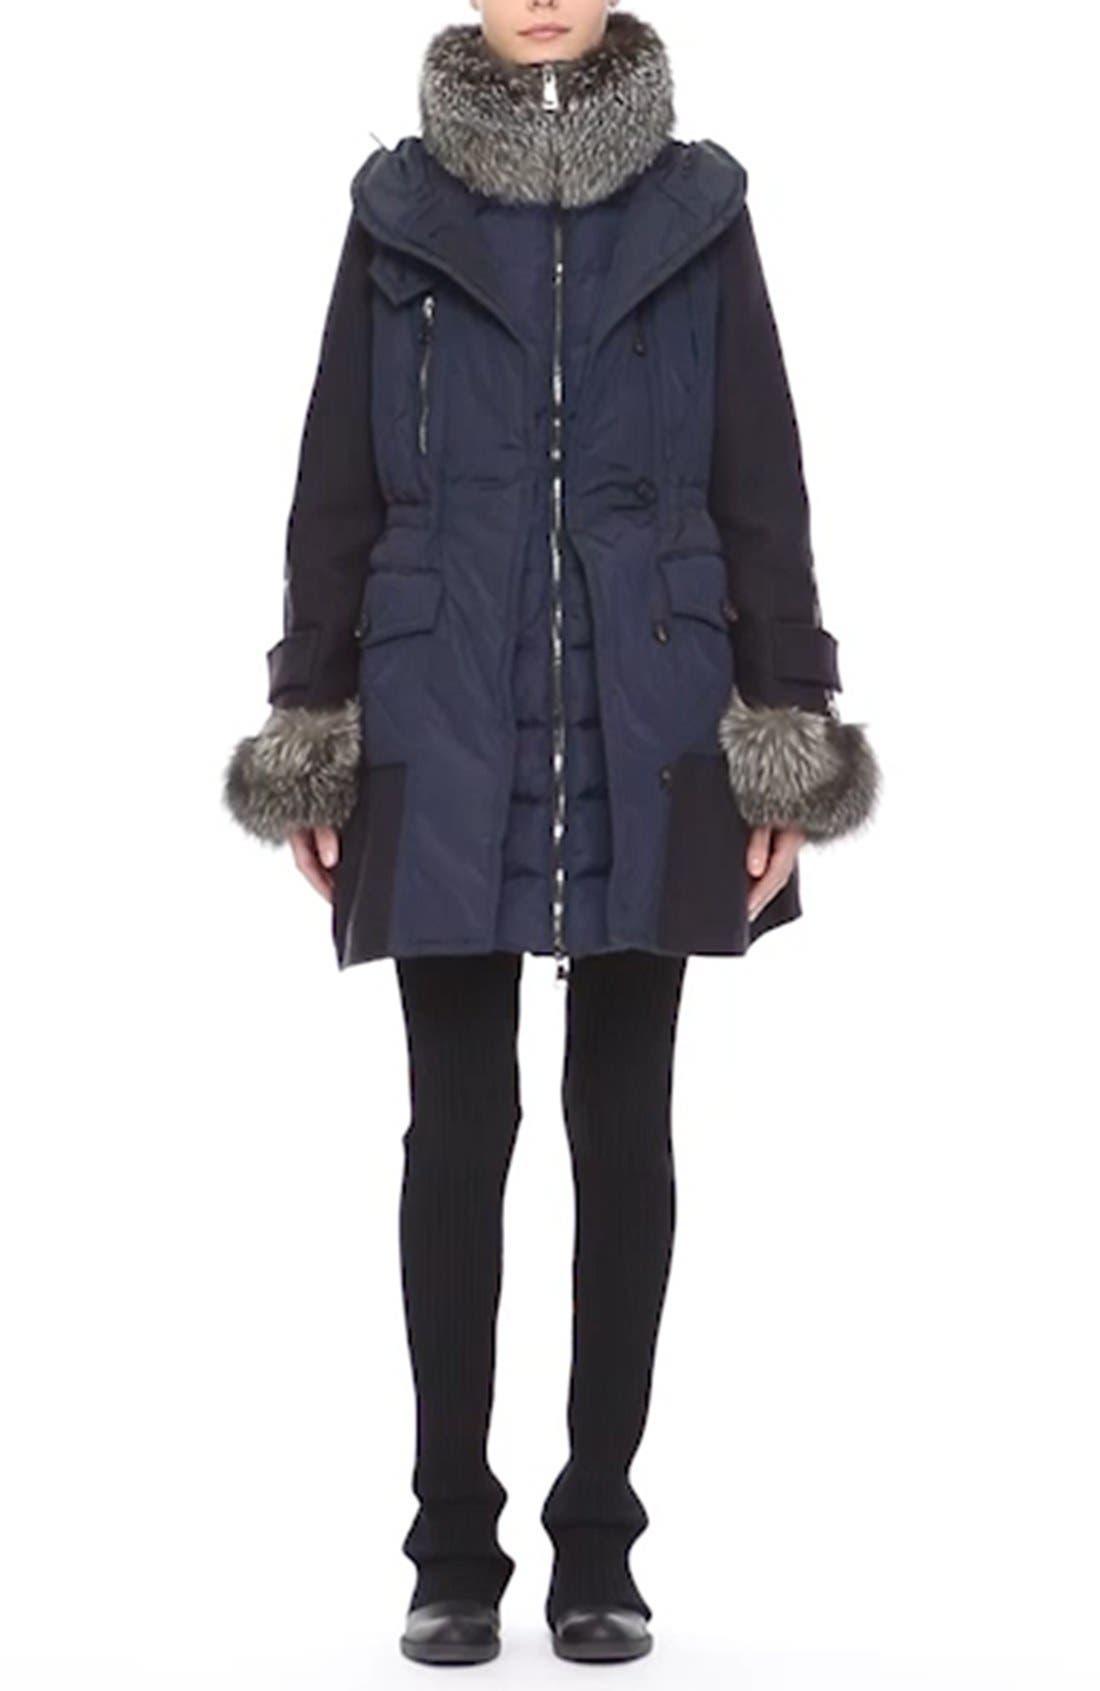 'Elestoria' Two-Piece Down Puffer Coat with Genuine Fox Fur Trim,                             Alternate thumbnail 8, color,                             419